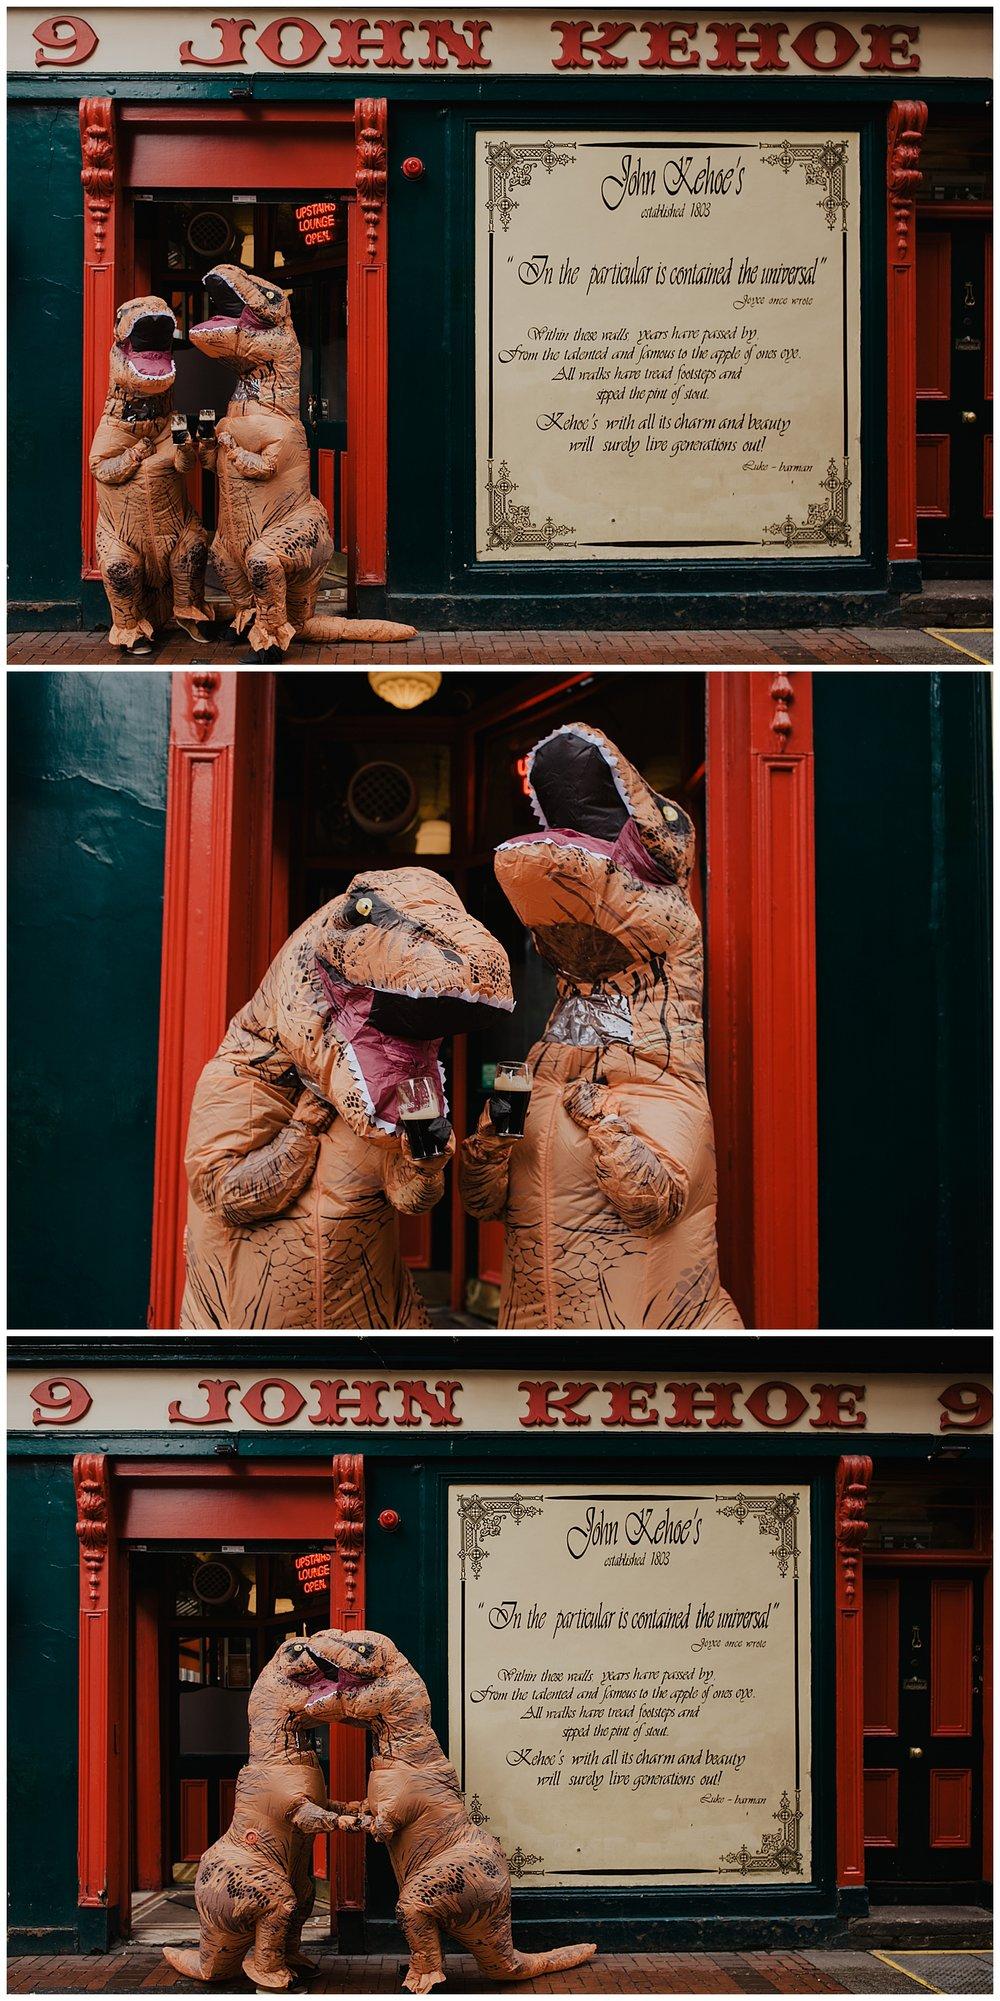 m-m-t-rex-engagement-session-wedding-photographer-dublin-ireland-livia-figueiredo-50.jpg